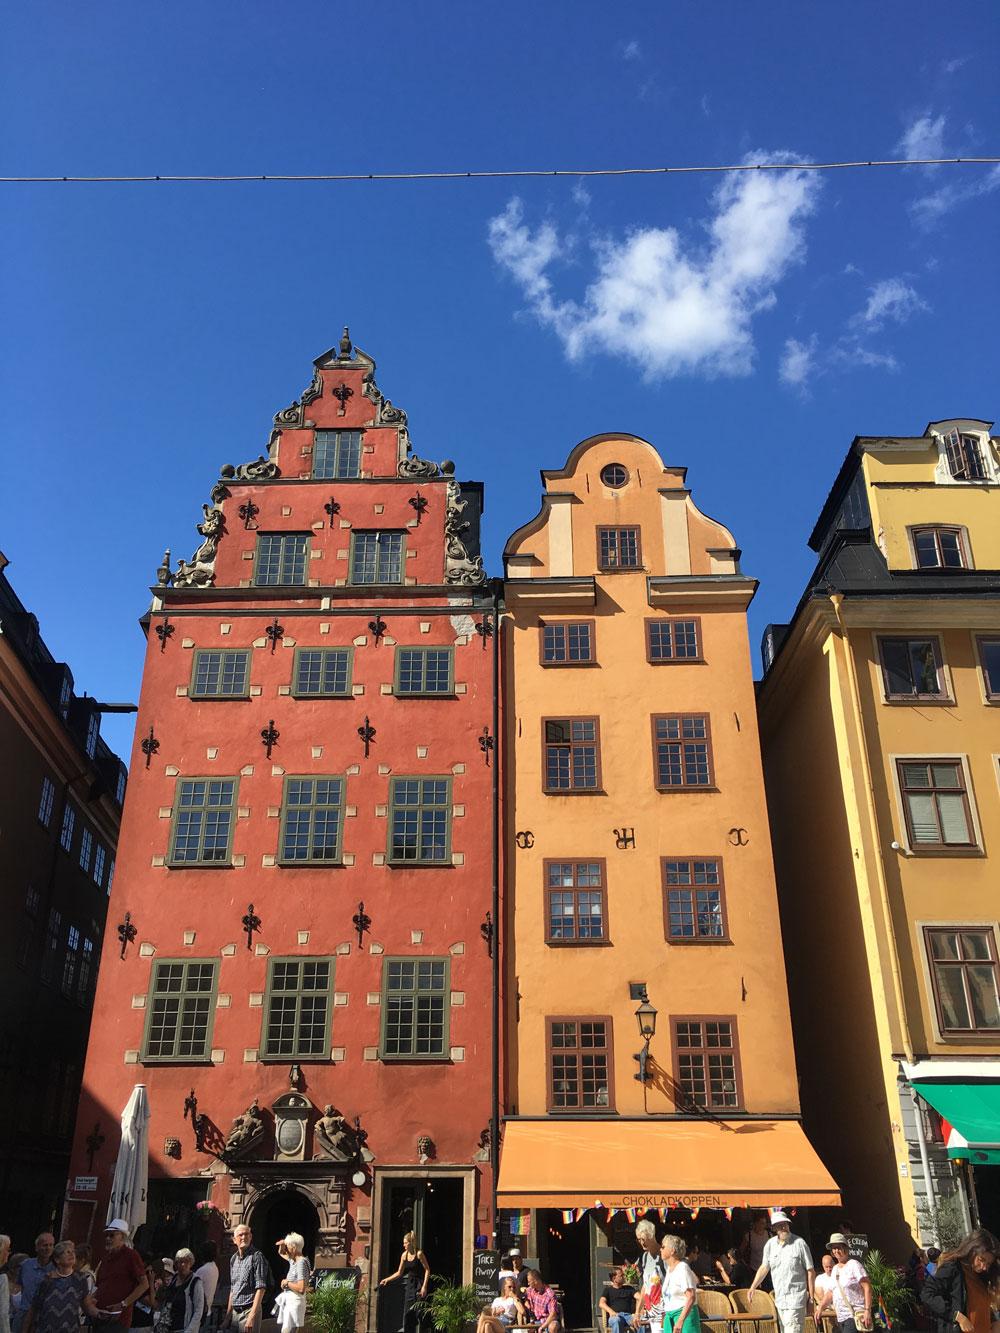 Stockholm-old-town.jpg